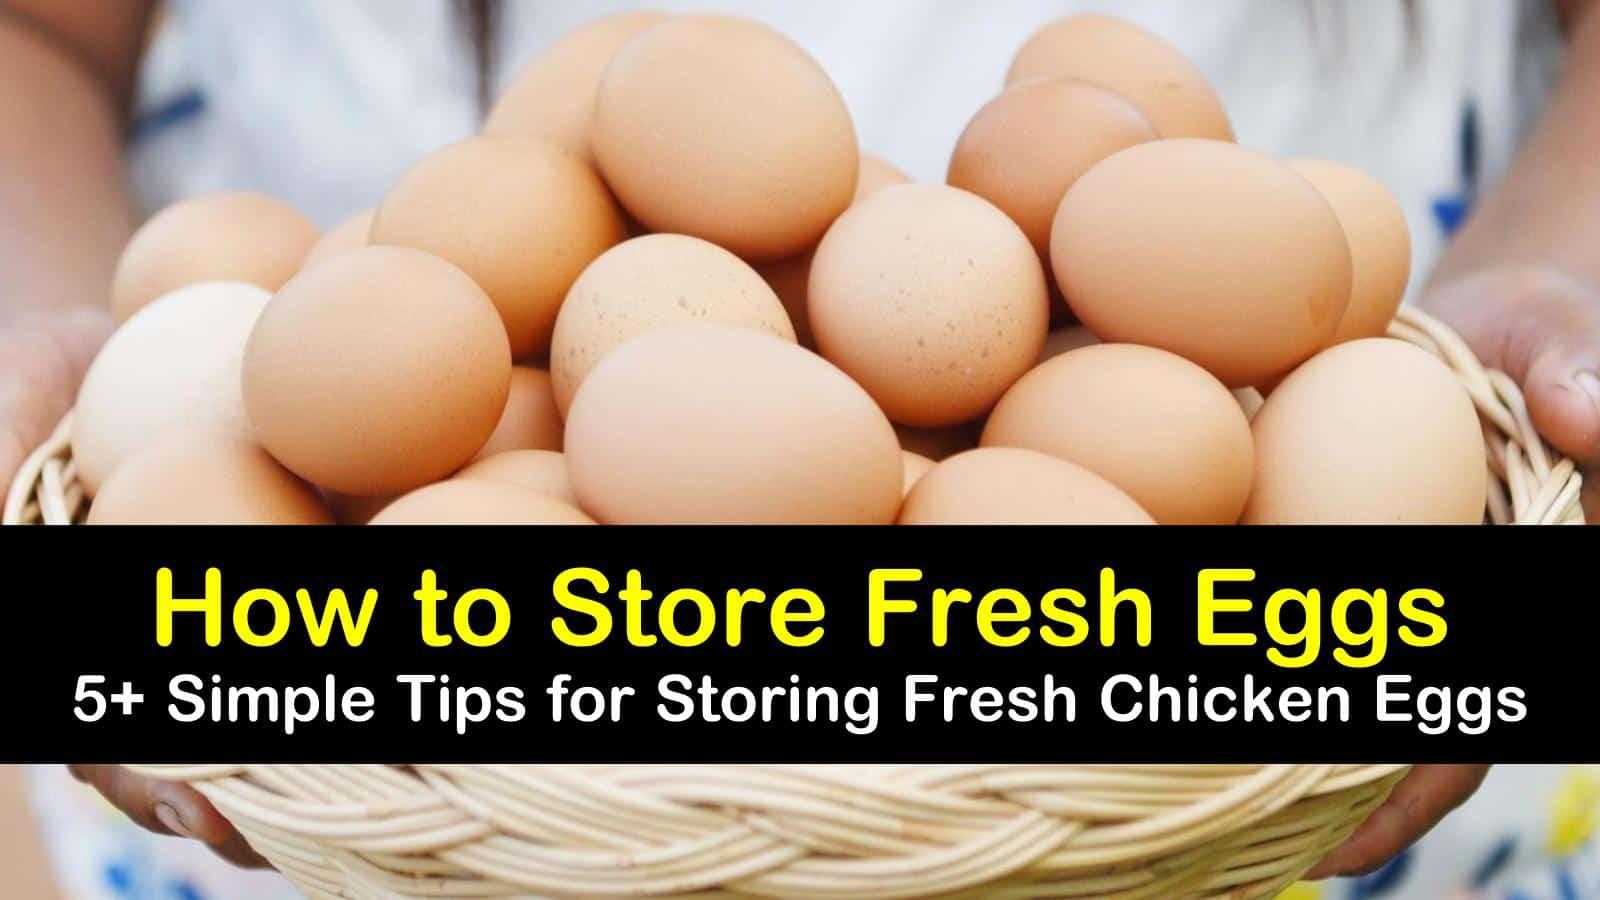 how to store fresh eggs titleimg1